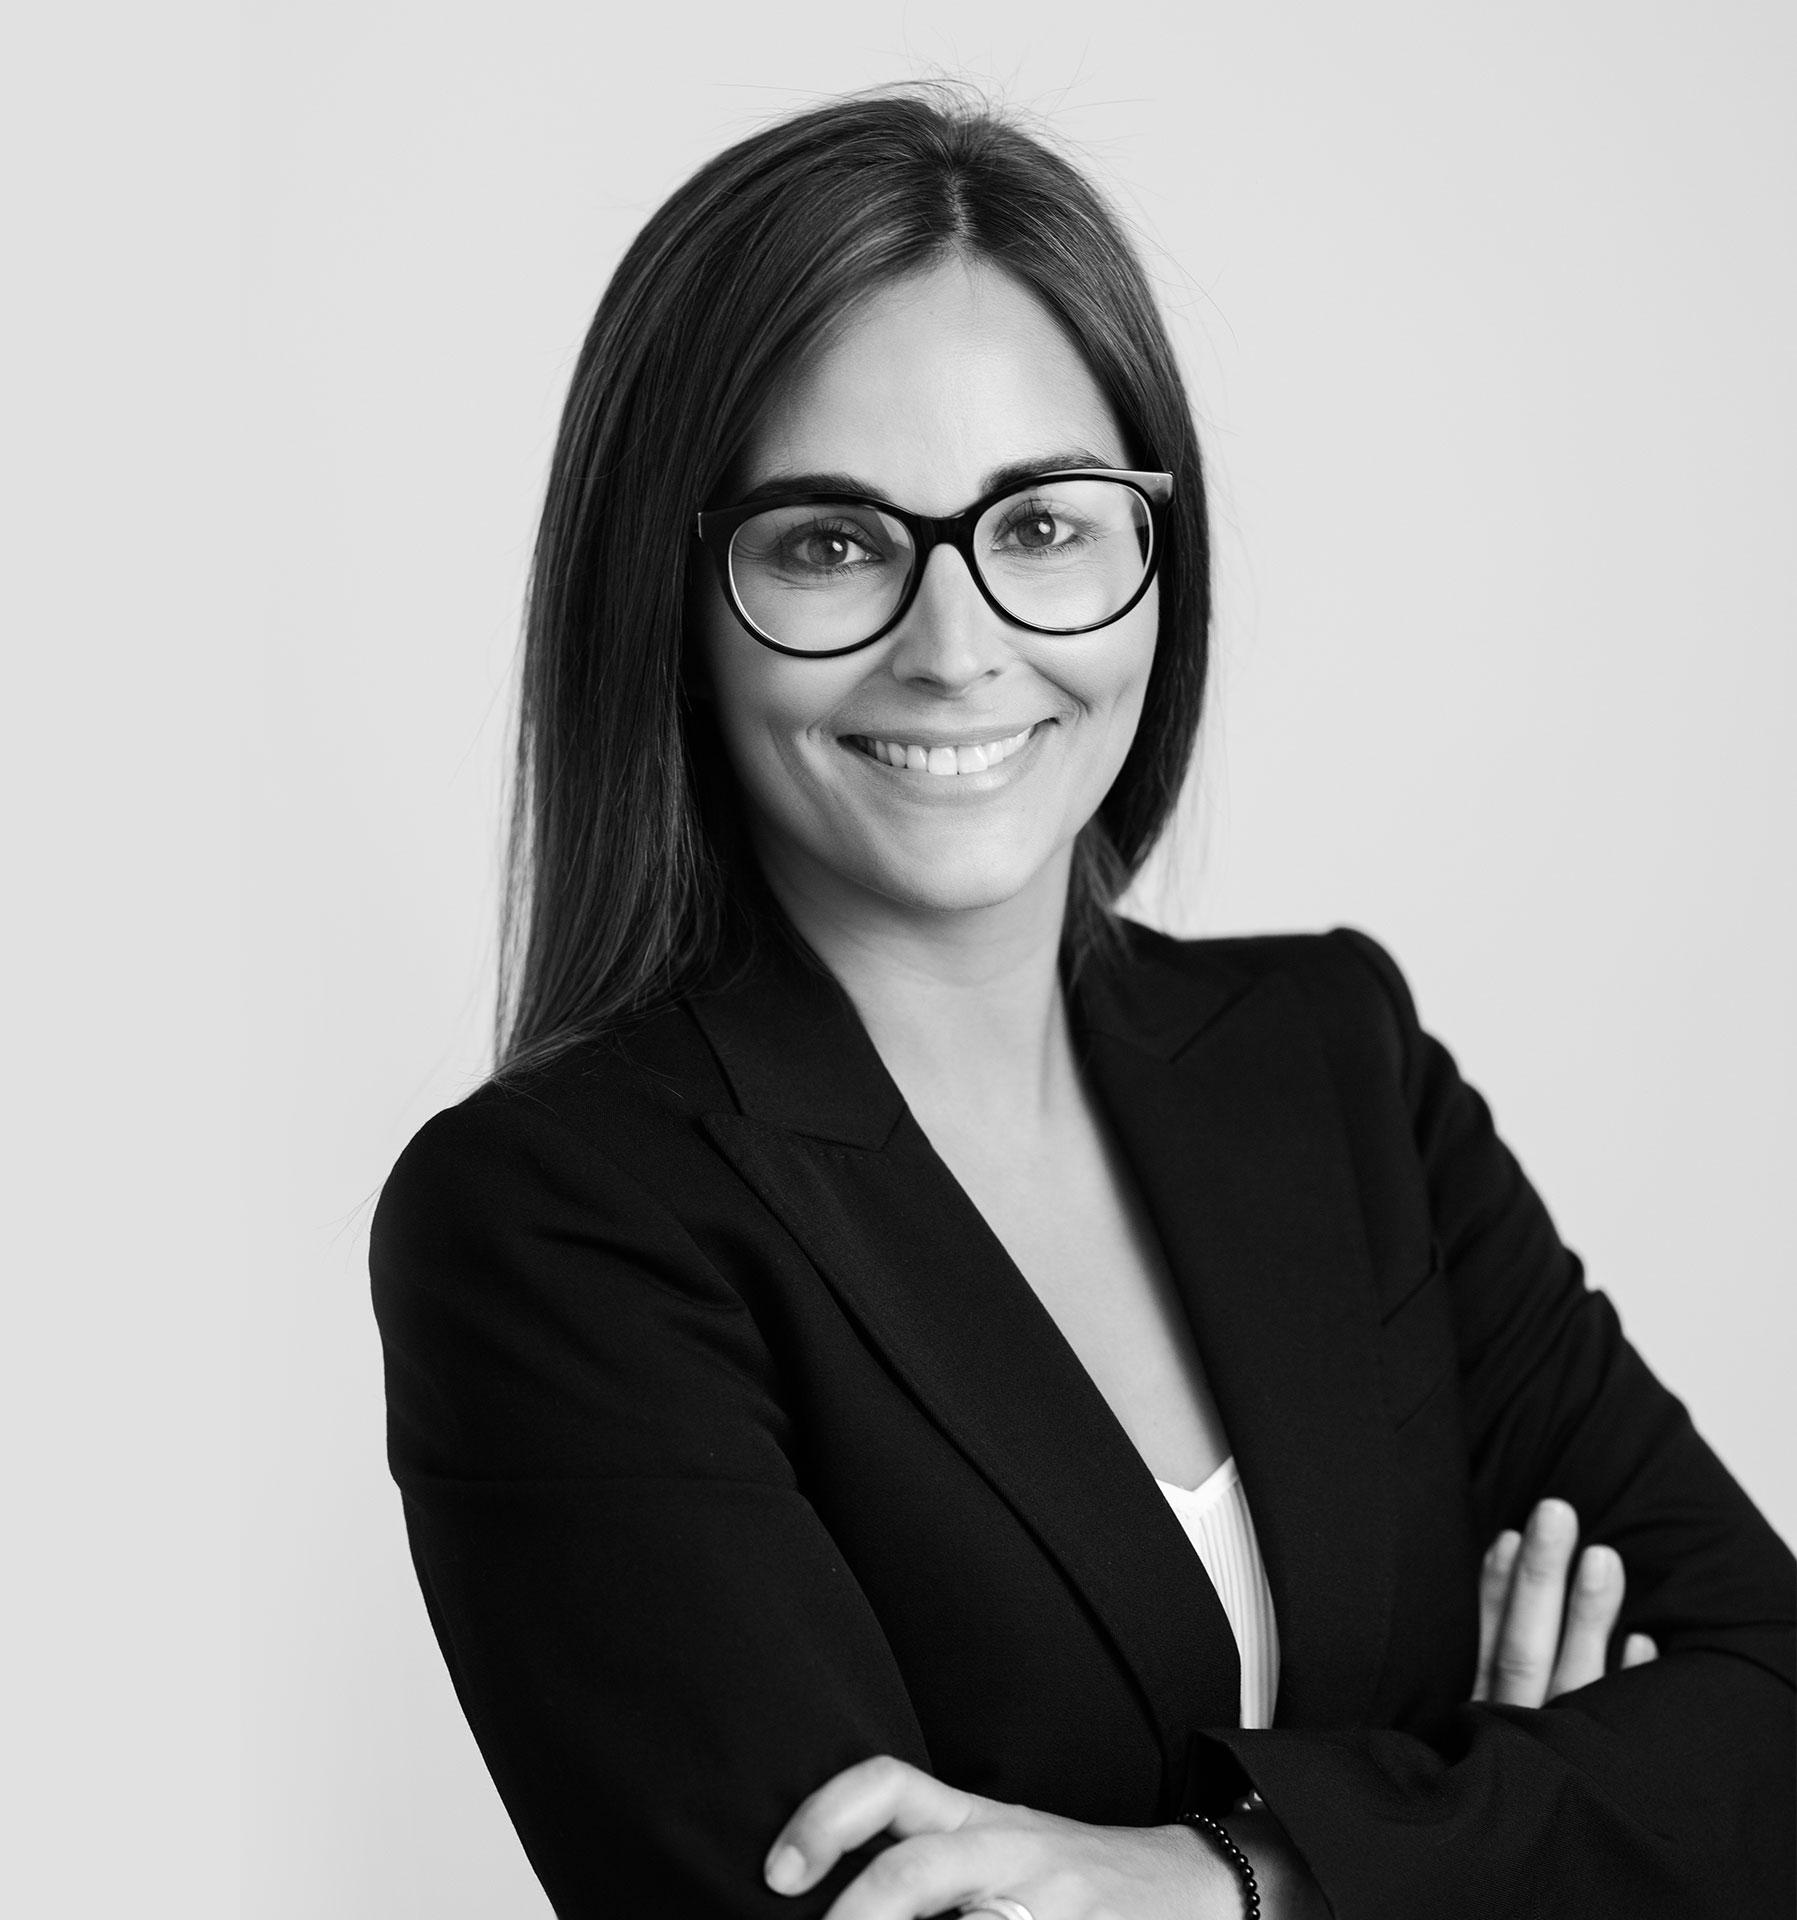 Andreia Lopes